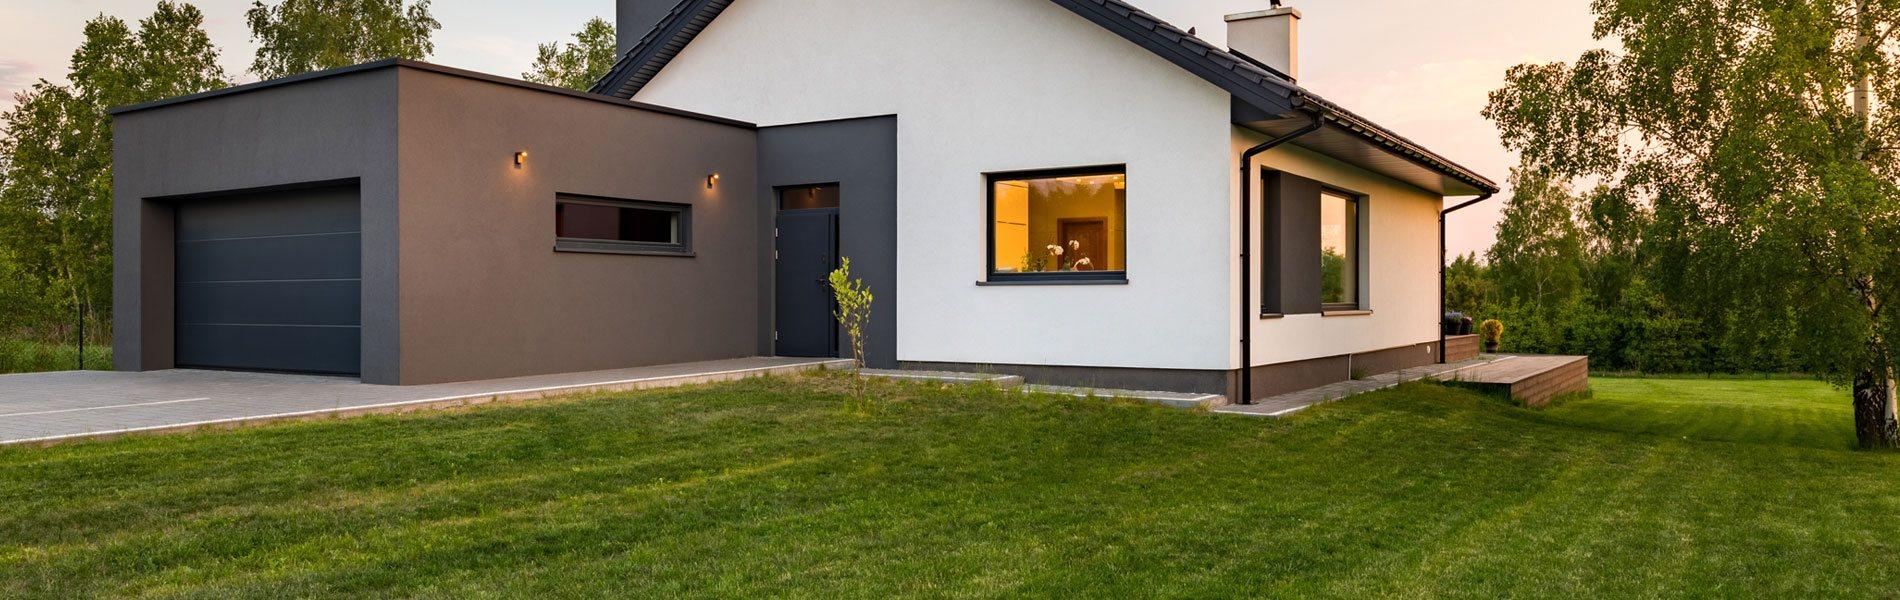 a typical garage photo image american and suburban in door neighborhood stock driveway